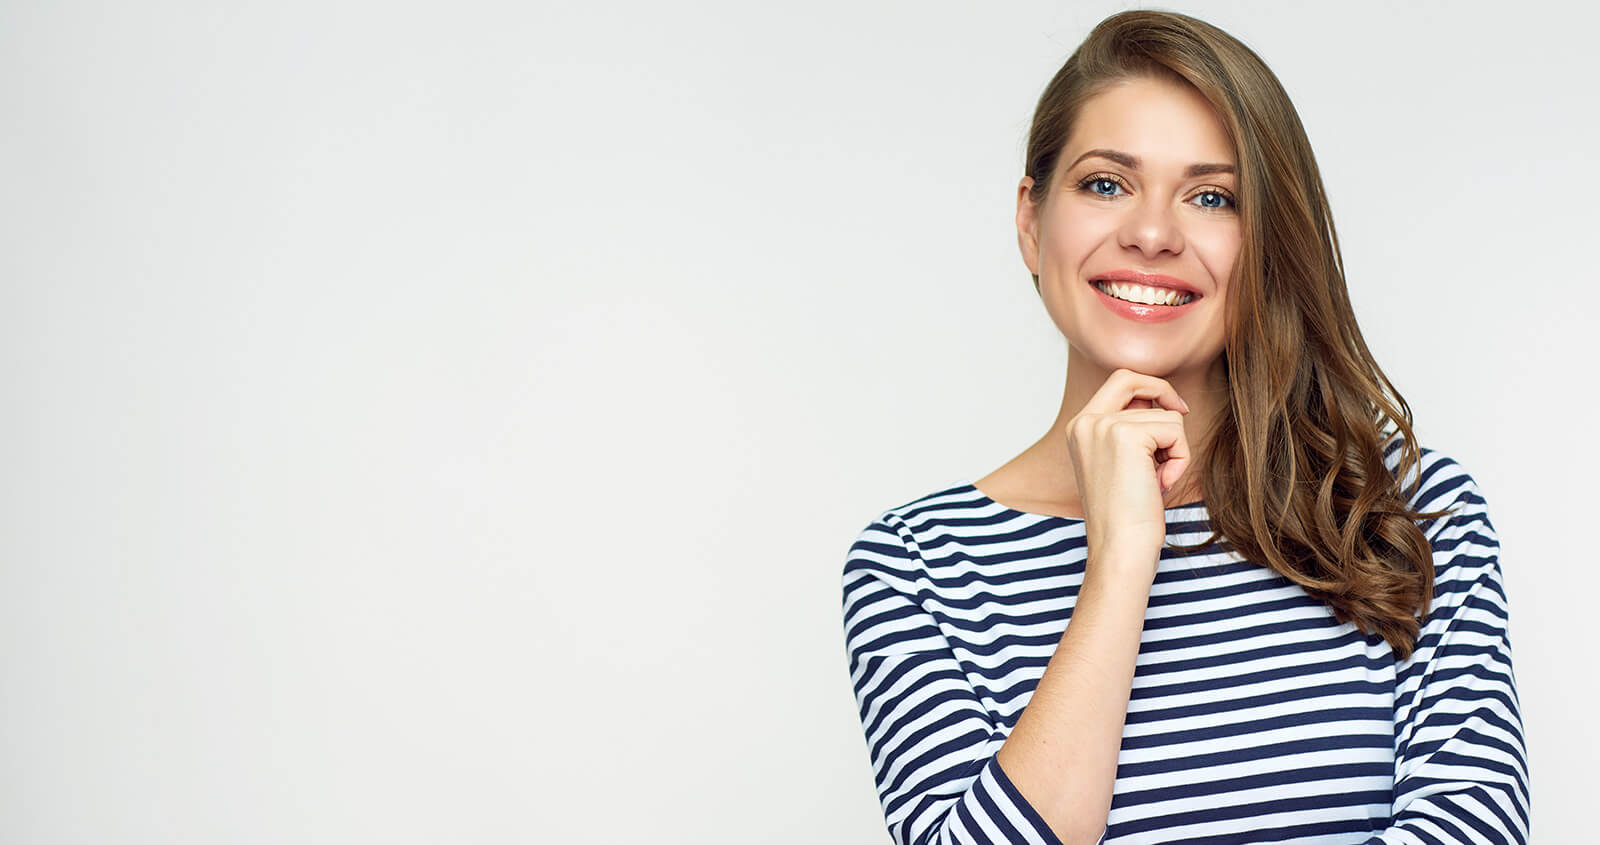 Highland, MI dentist explains the dental crown (tooth cap) procedure